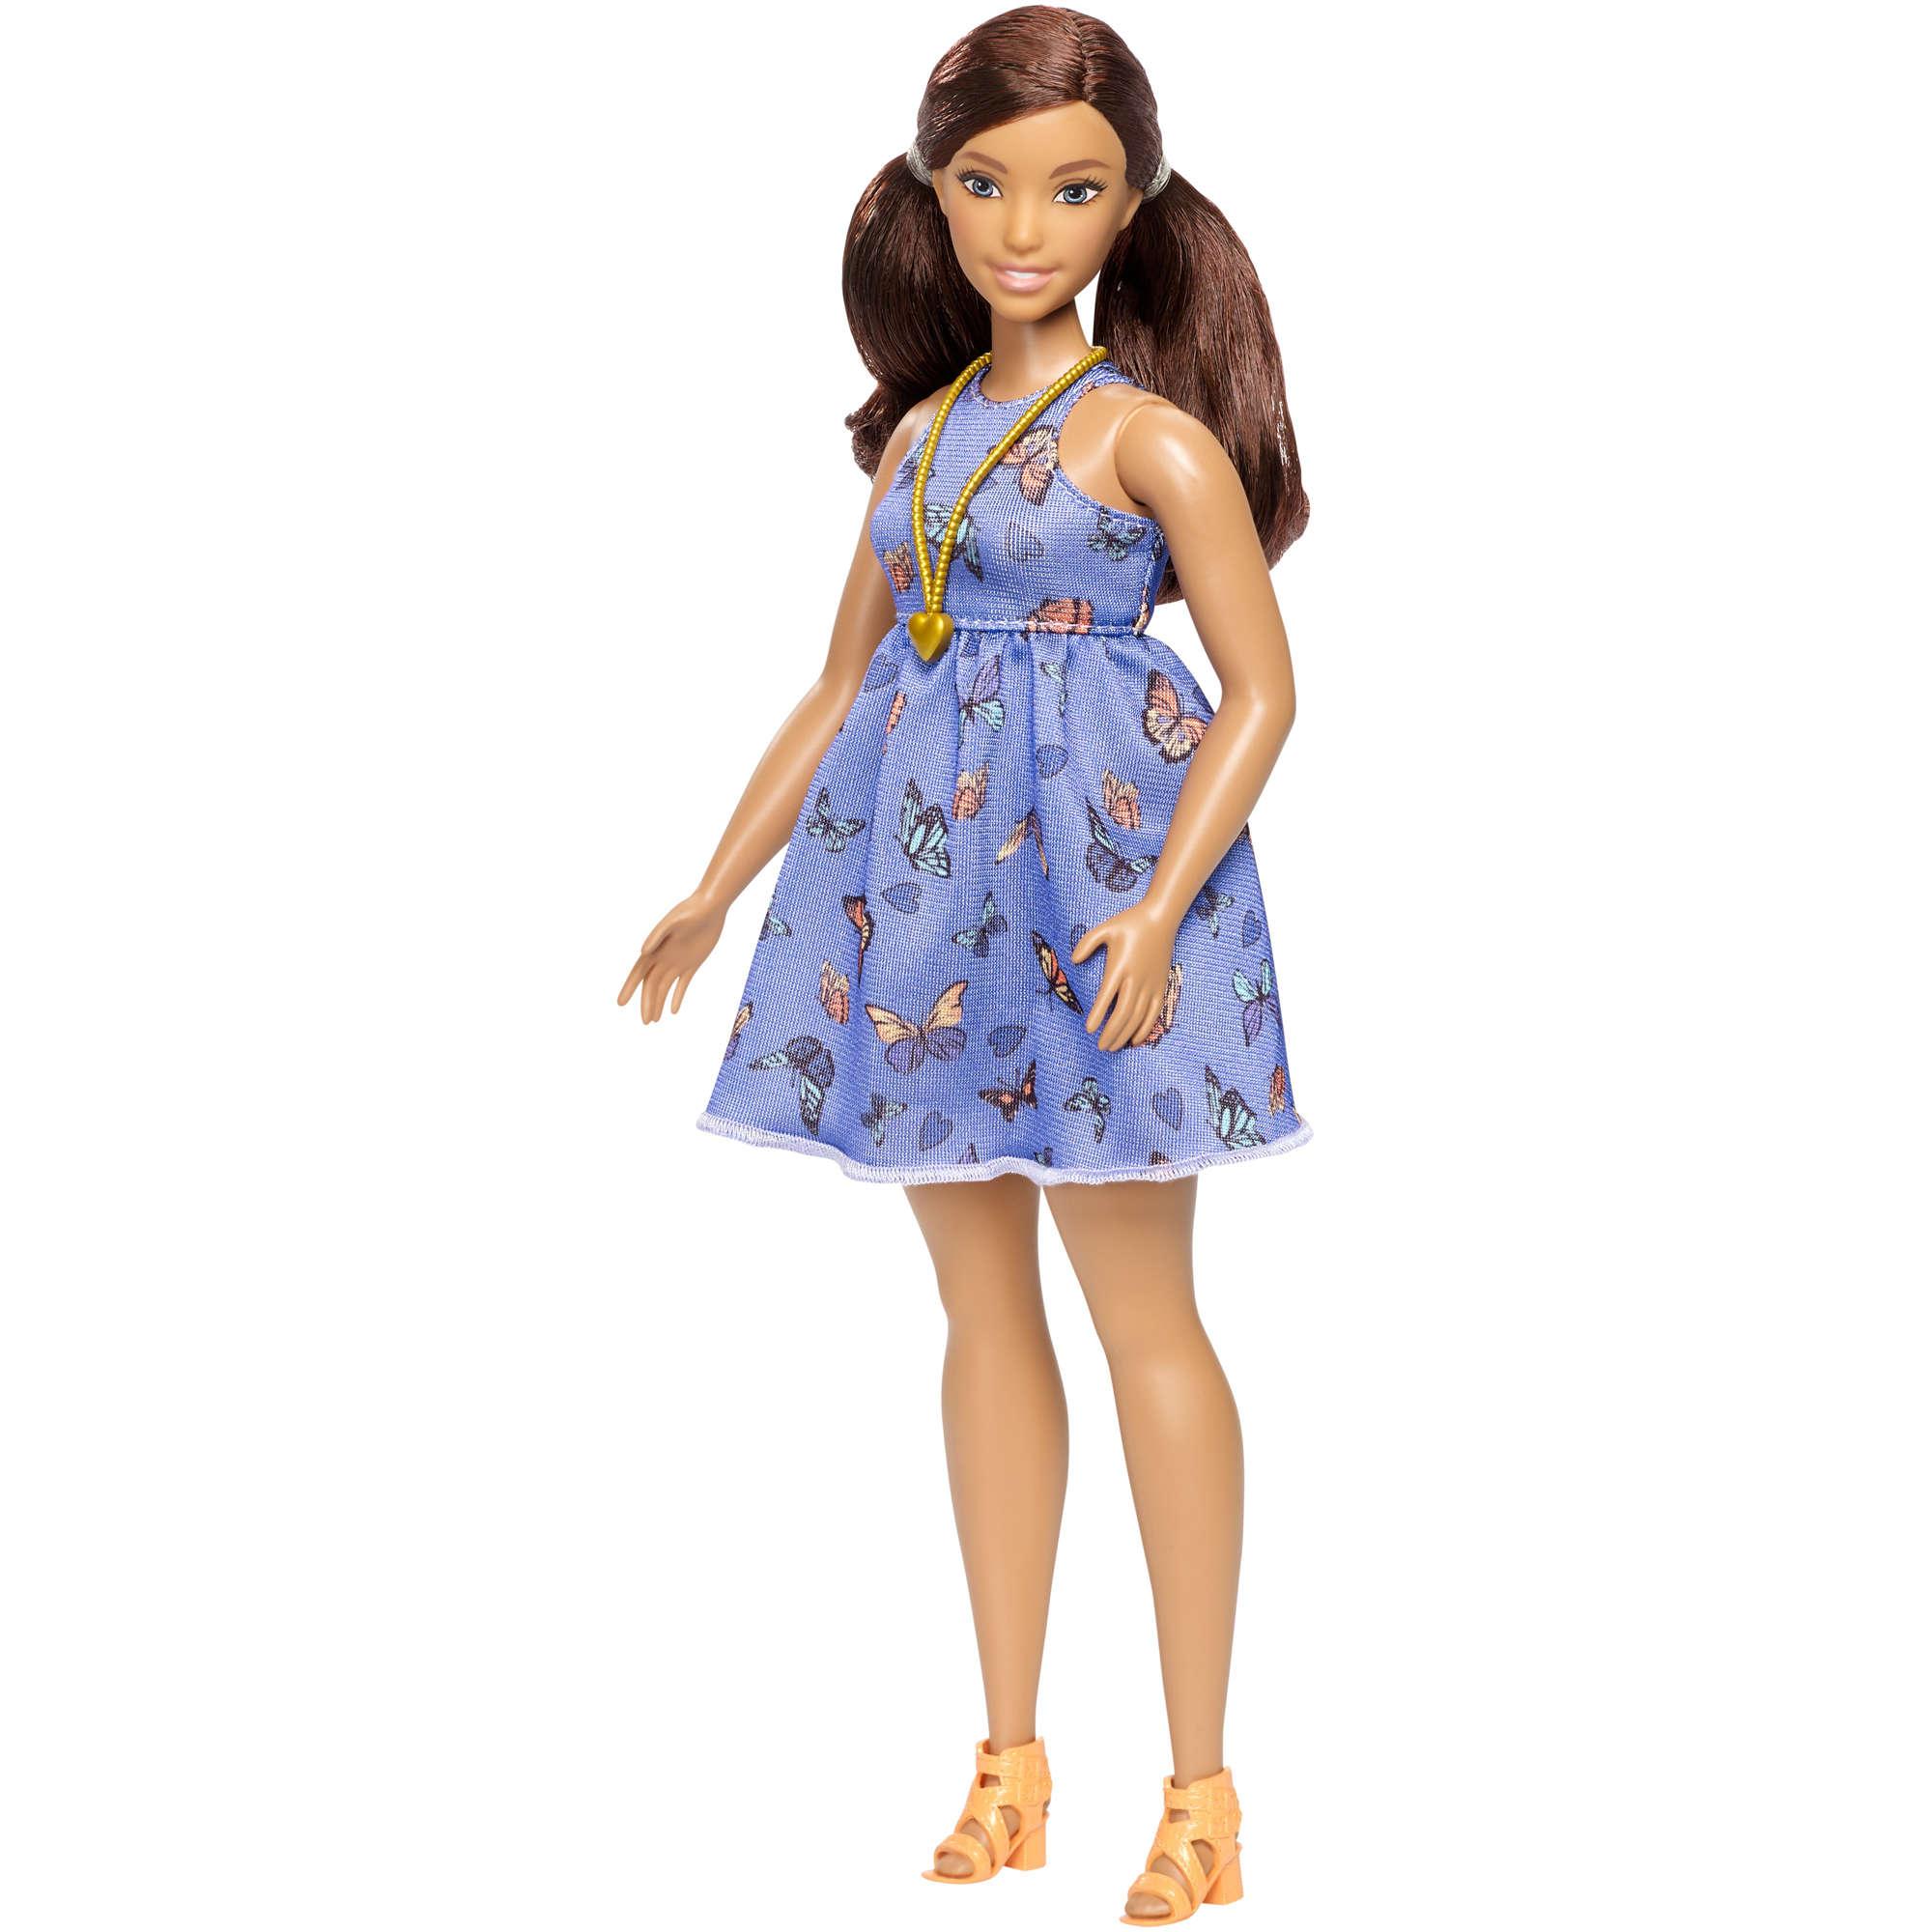 Barbie Fashionistas Curvy Doll 66 Beautiful Butterflies